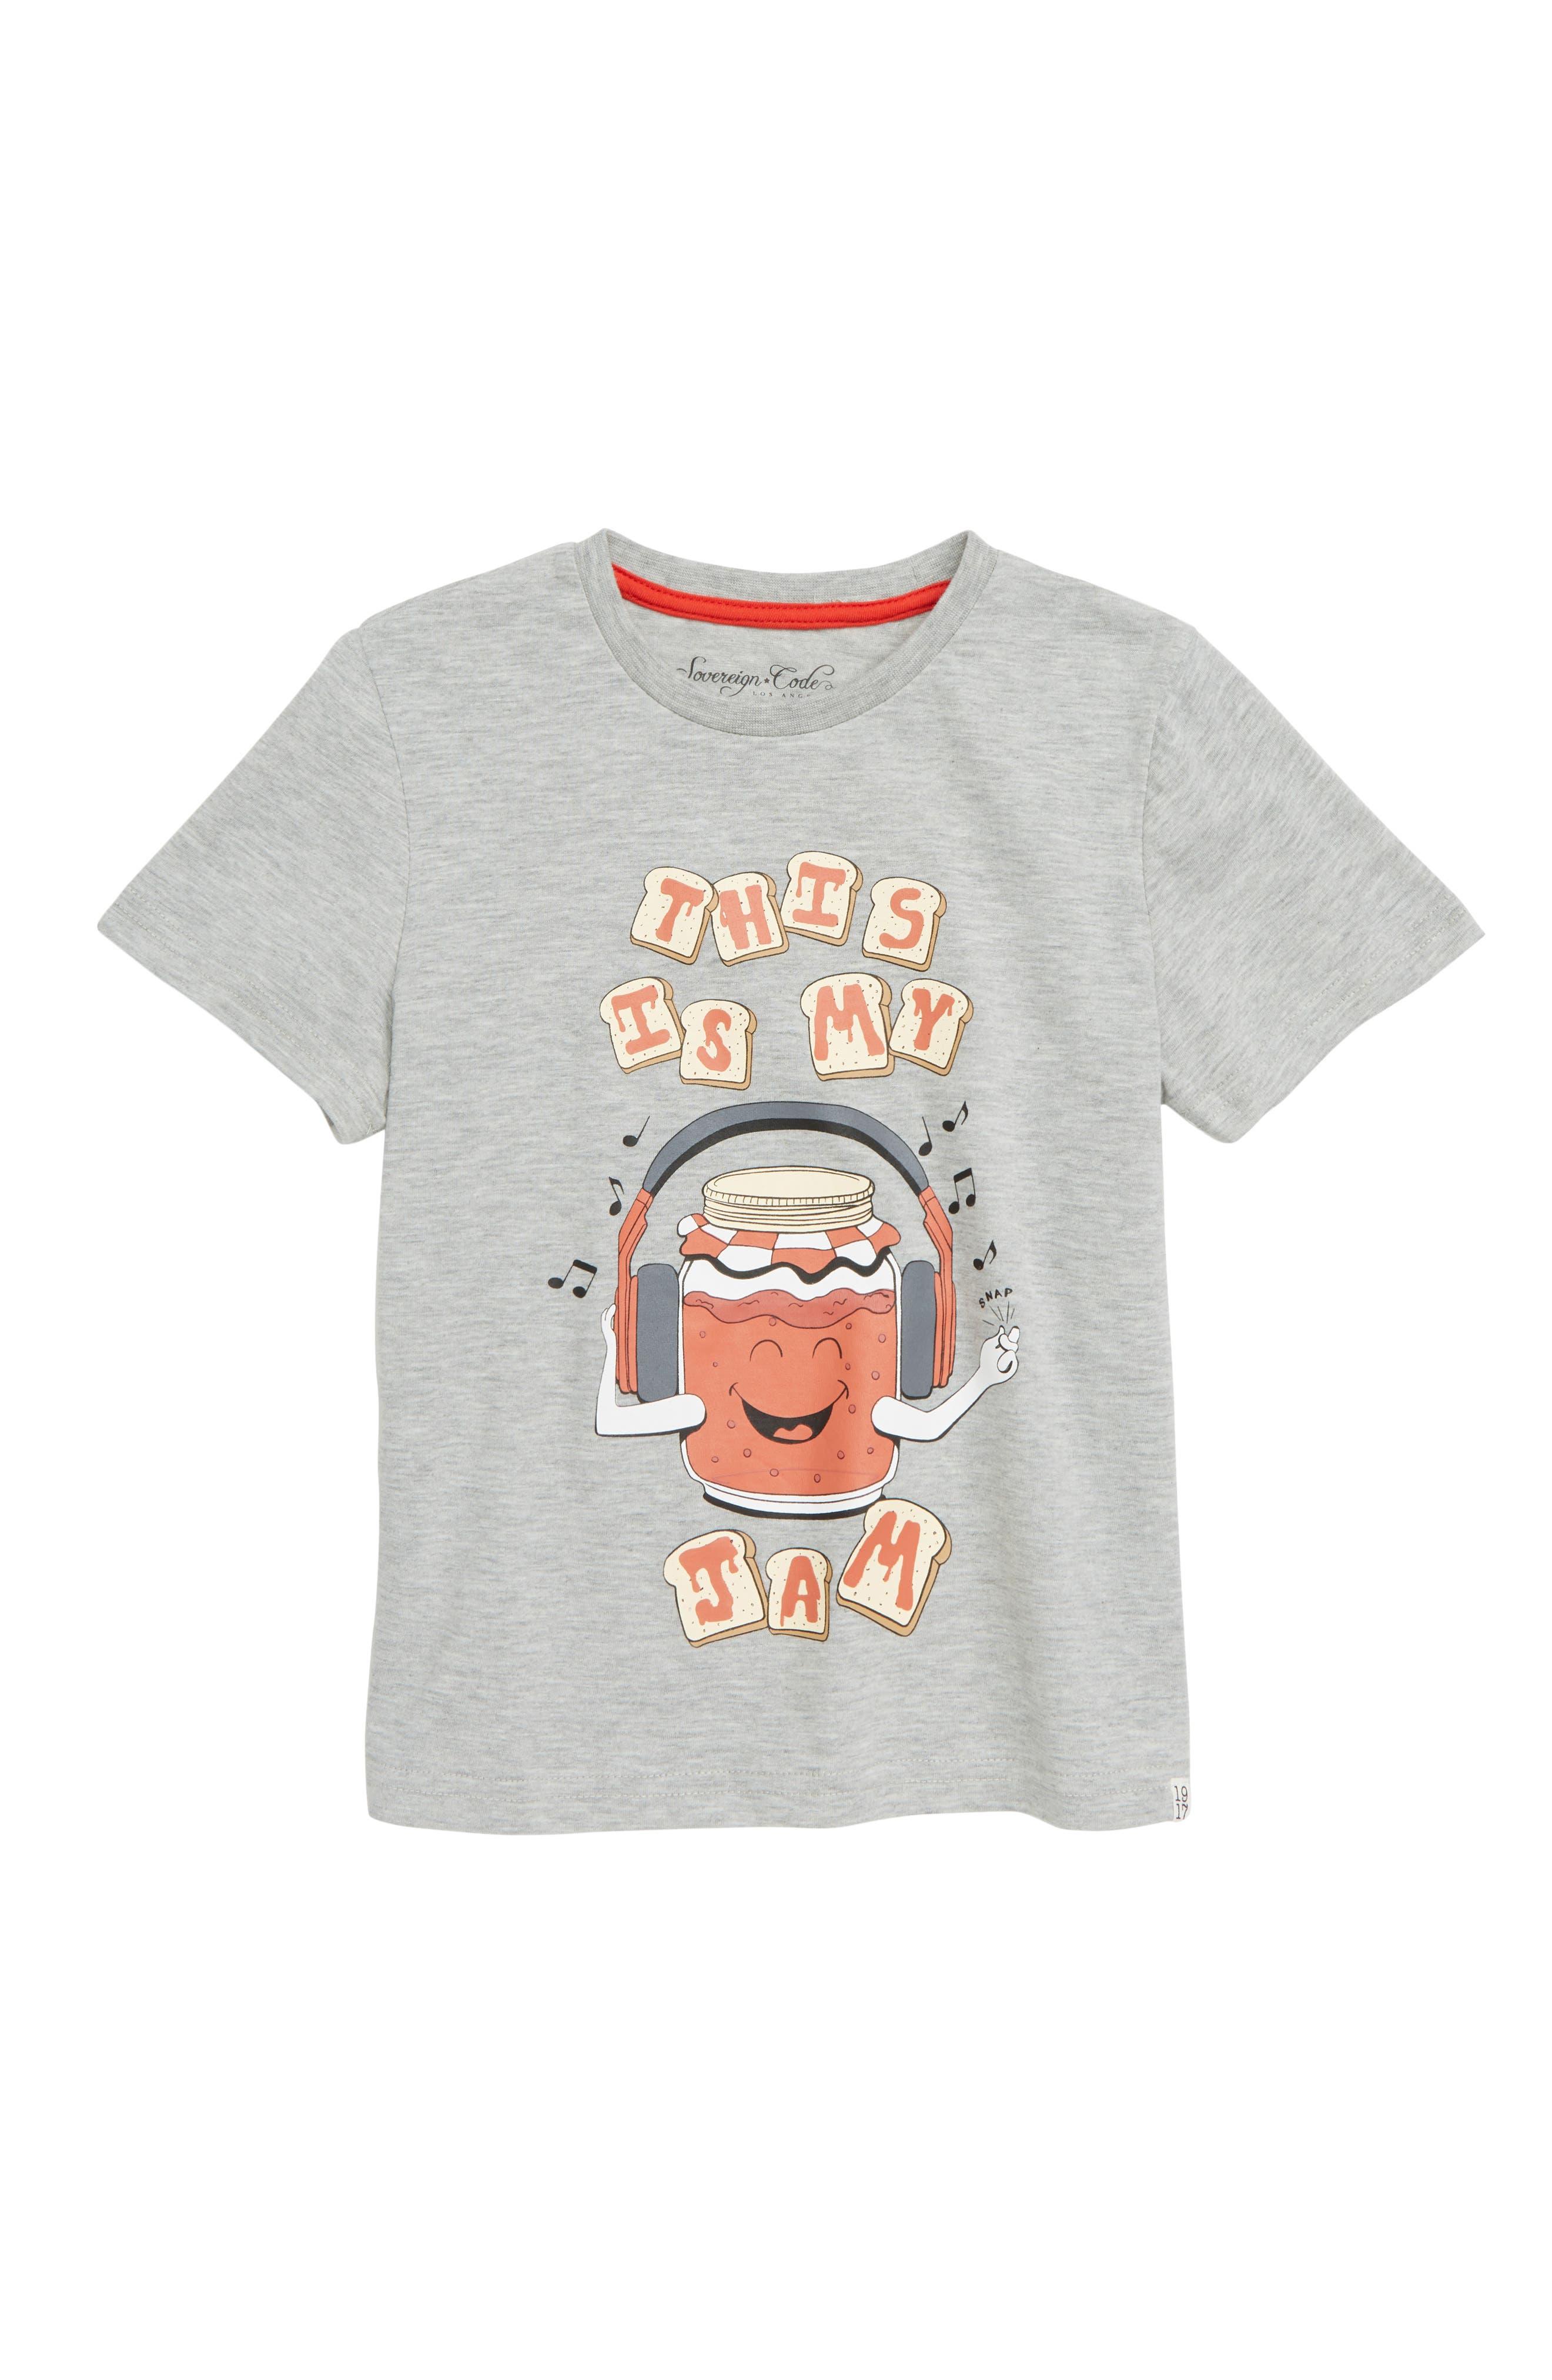 Rome Bronuts Graphic T-Shirt,                             Main thumbnail 1, color,                             Jam/ Heather Grey